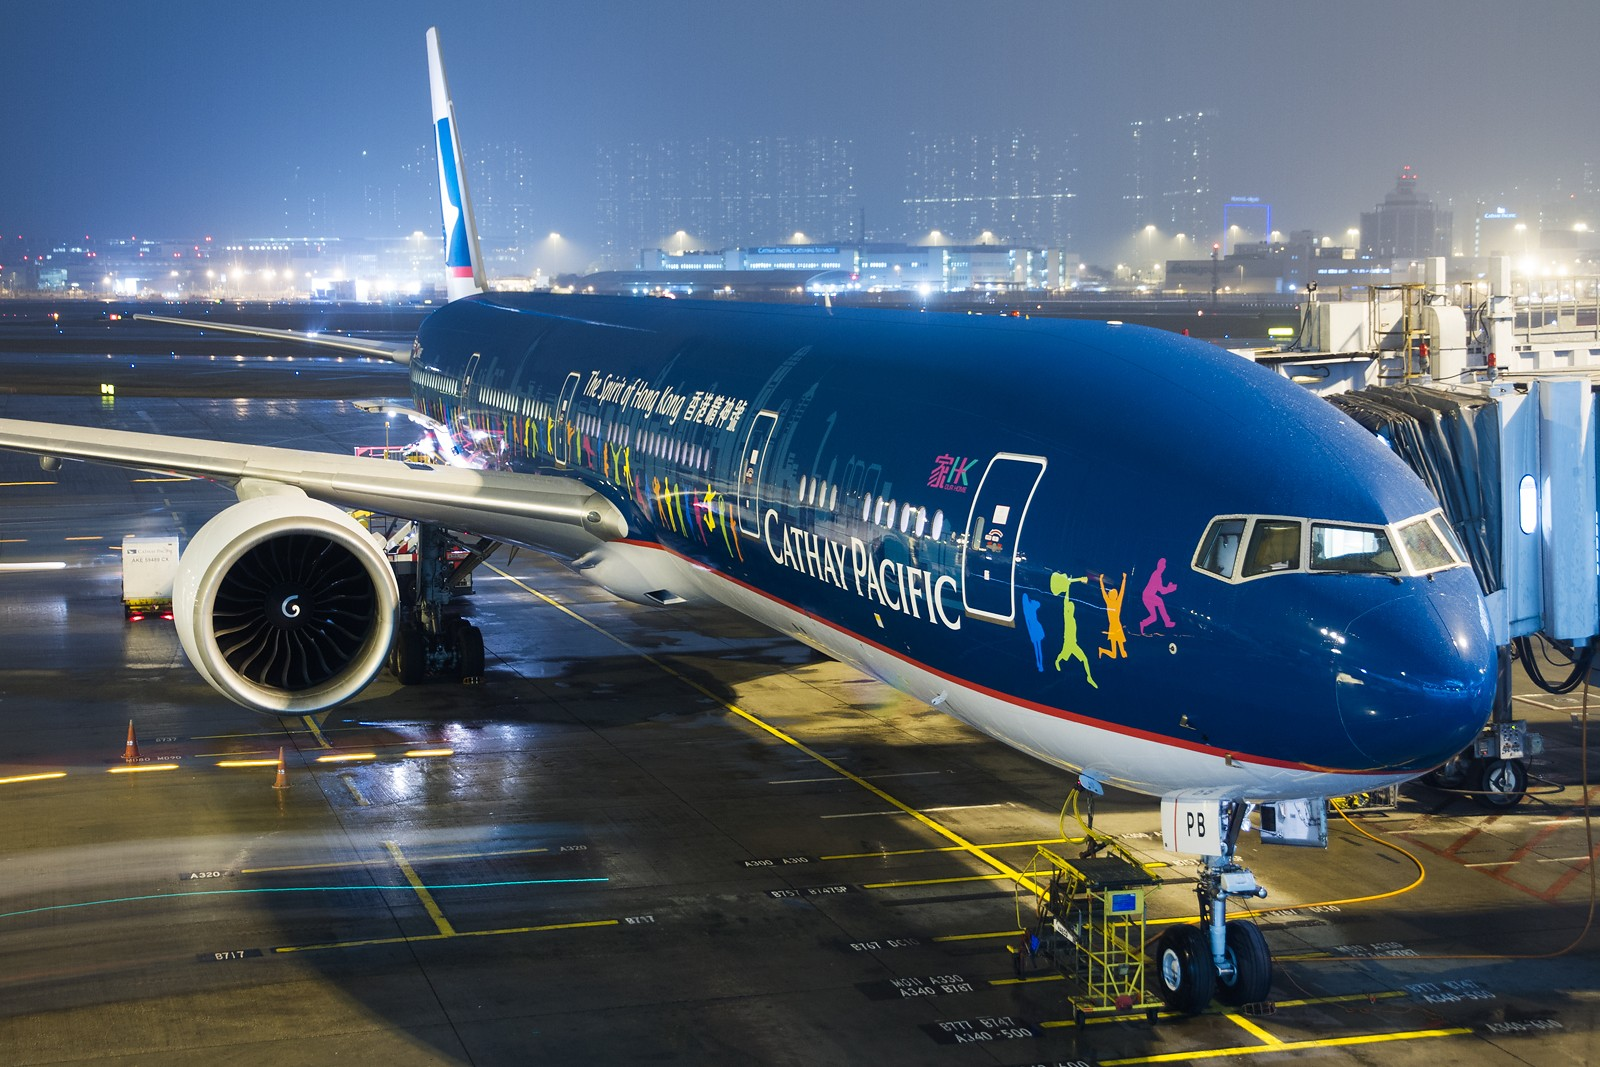 Re:[原创]【SHA/PVG/NKG/HKG/PEK】***********2014年度总结*********** BOEING 777-300ER B-KPB 中国香港赤鱲角国际机场